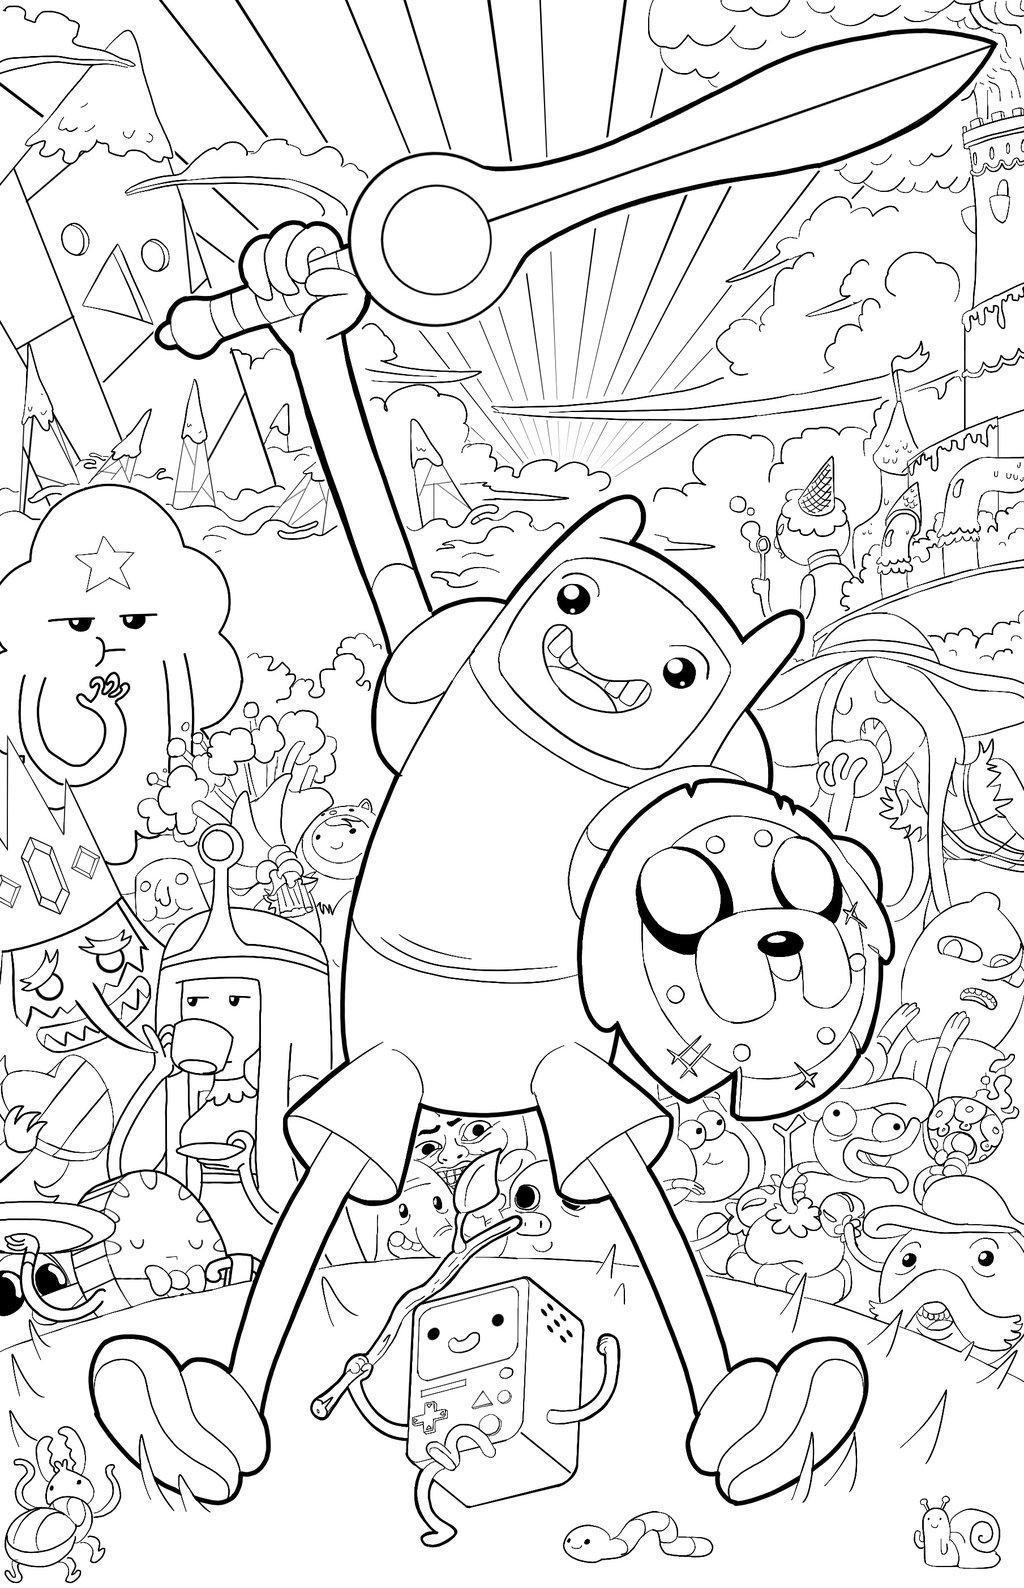 Adventure Time Funko Pop Kleurplaat Раскраска Время Приключений Раскраски Время Приключений